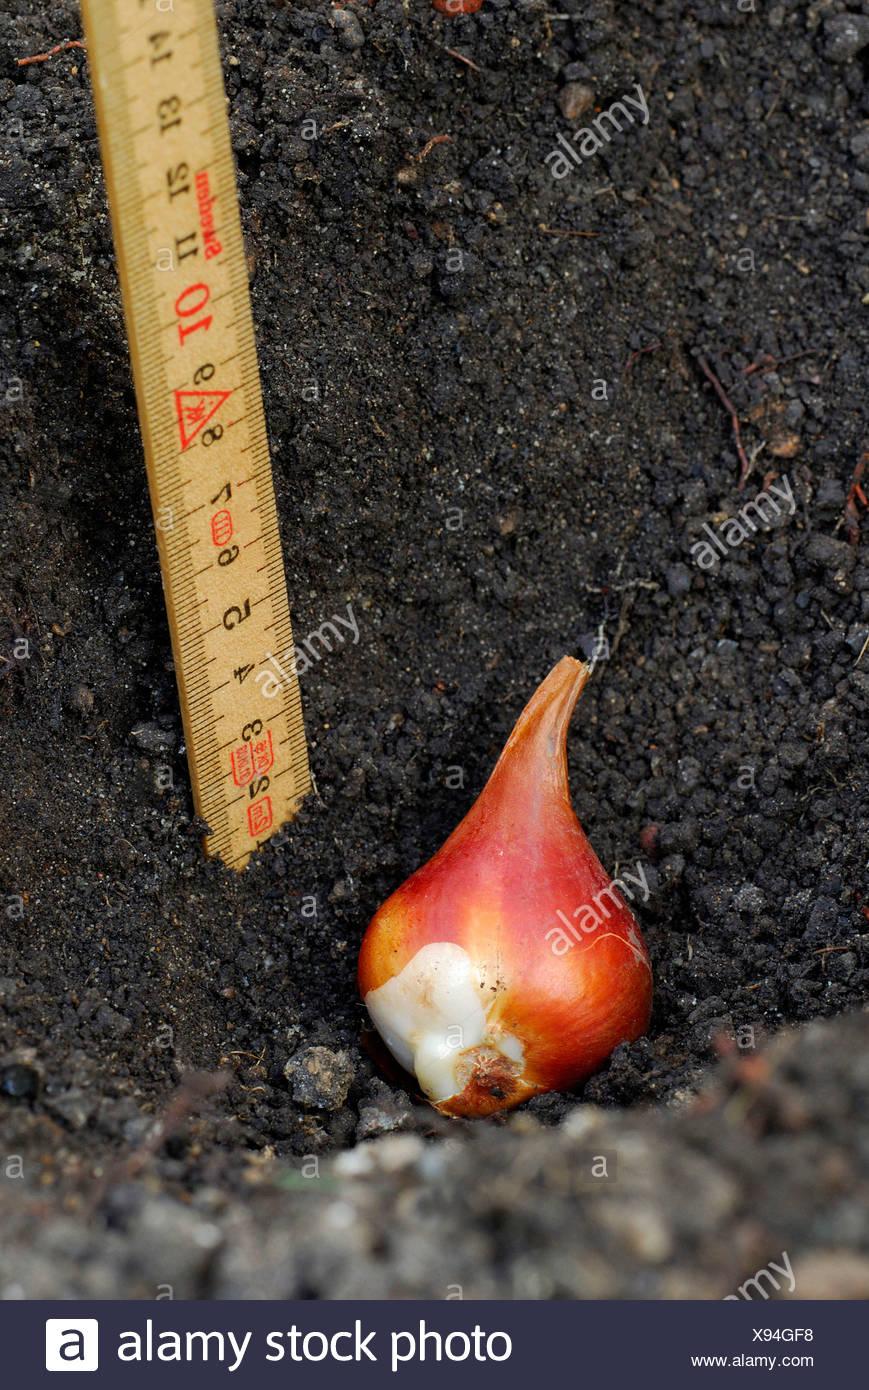 Tulip bulb - Stock Image